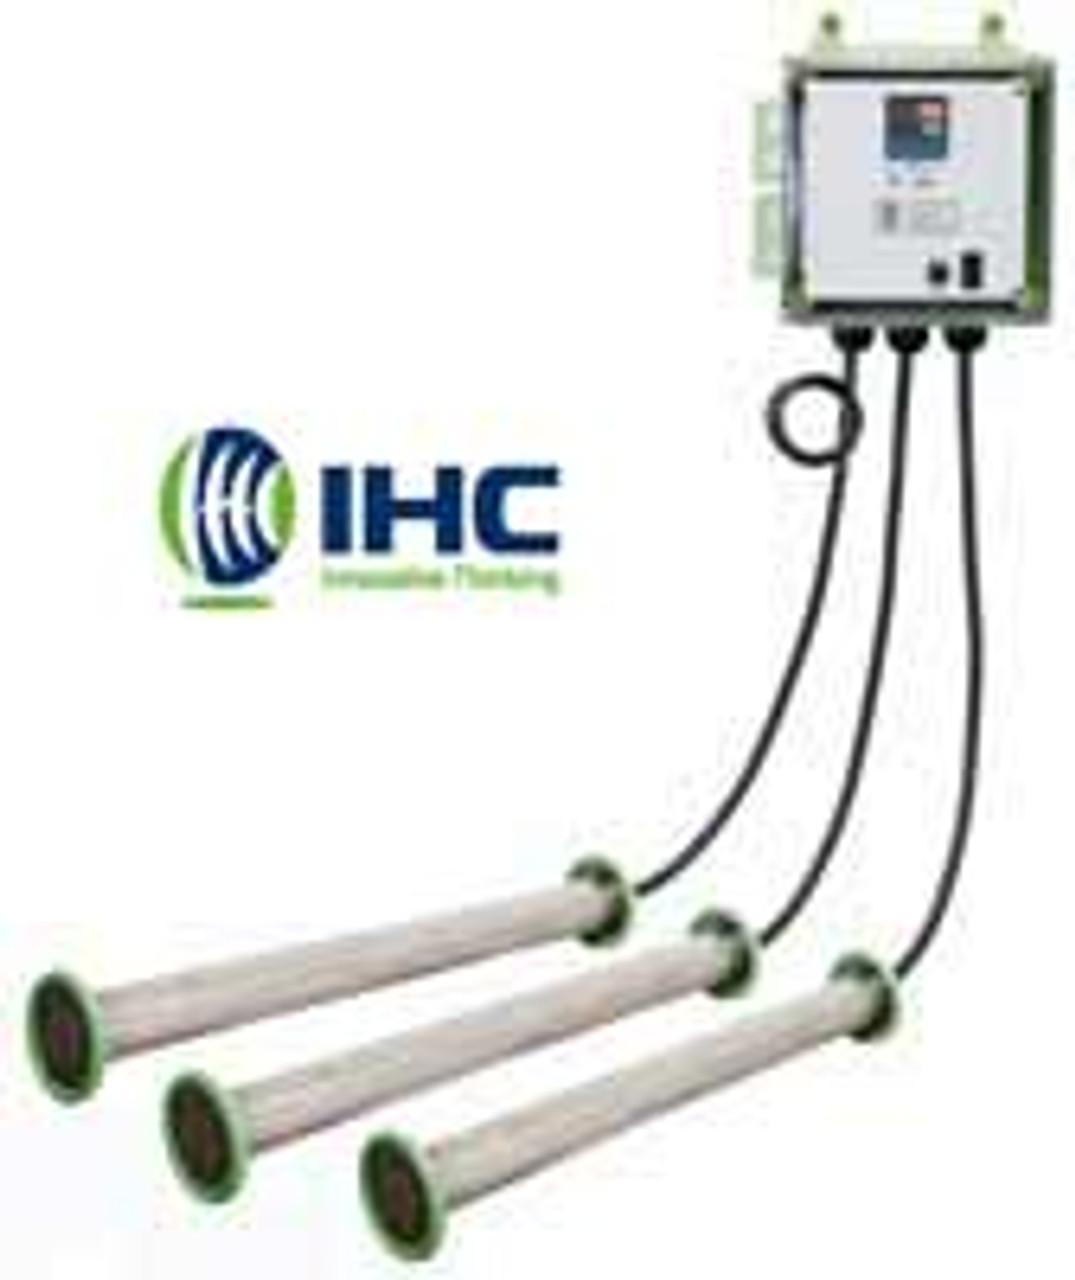 Innovative Heat Concepts 4KW (4000W) 240VAC Heater with Digital Temperature Controller (Nema 4 enclosure) (QDPTY4.0.2)